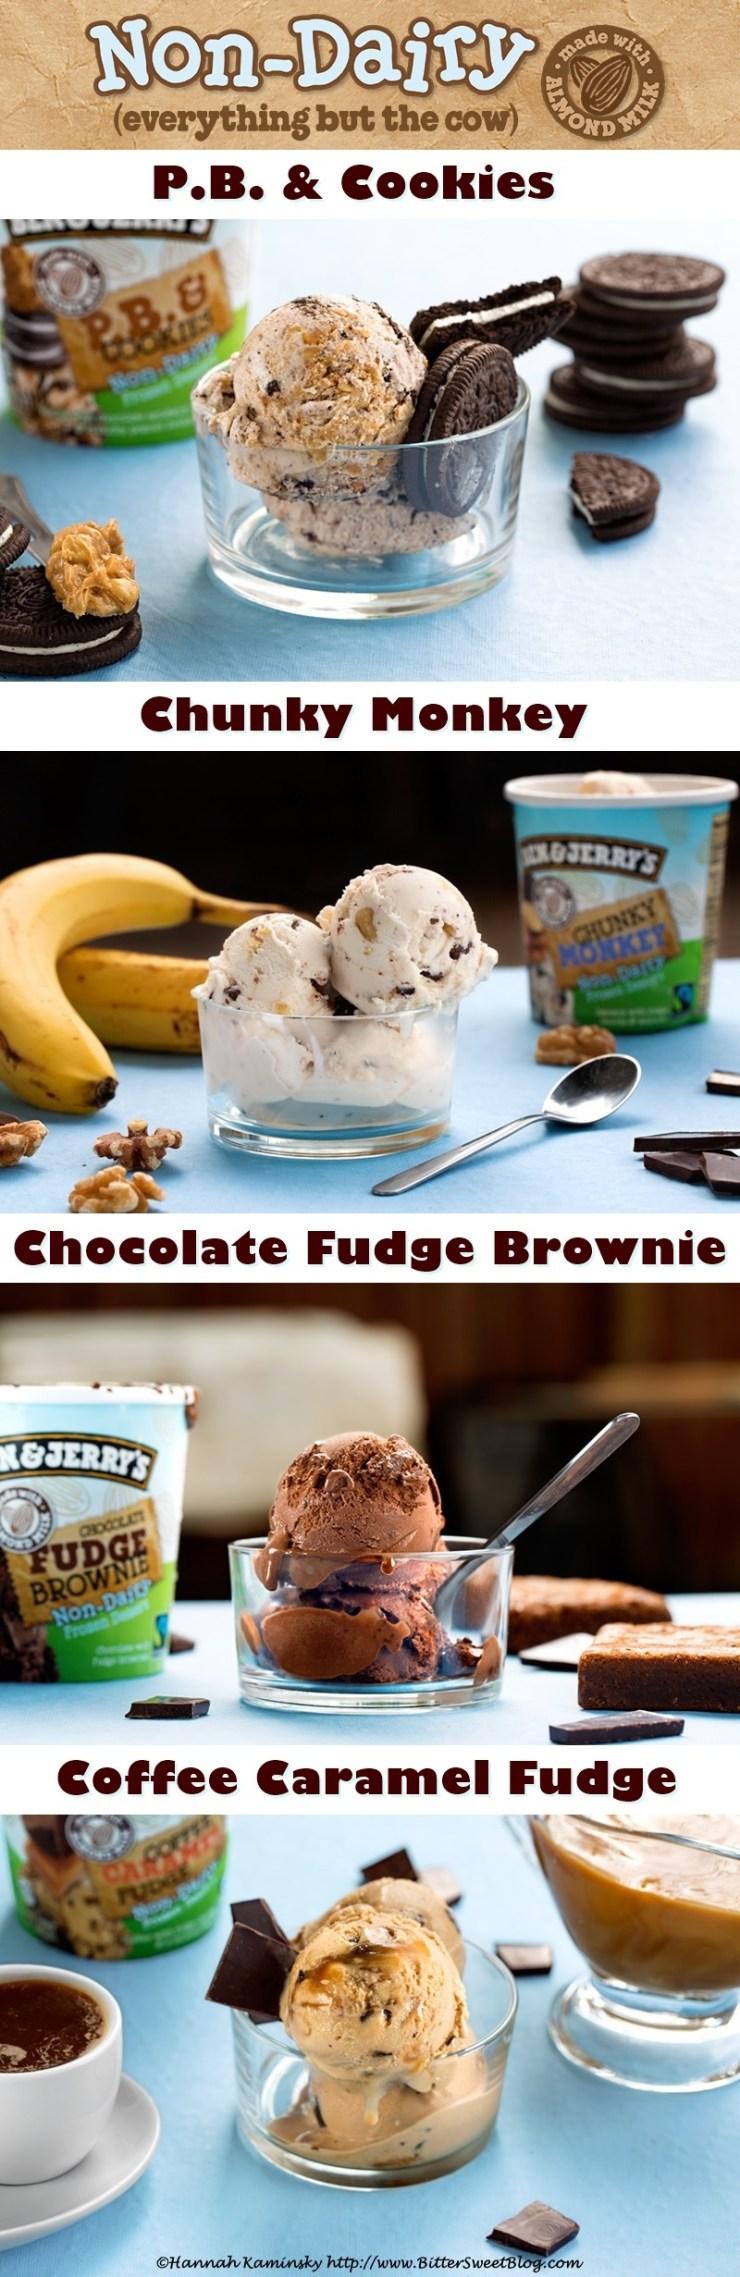 Ben-Jerrys-Non-Dairy-Ice-Cream-all-the-vegan-flavors.jpg